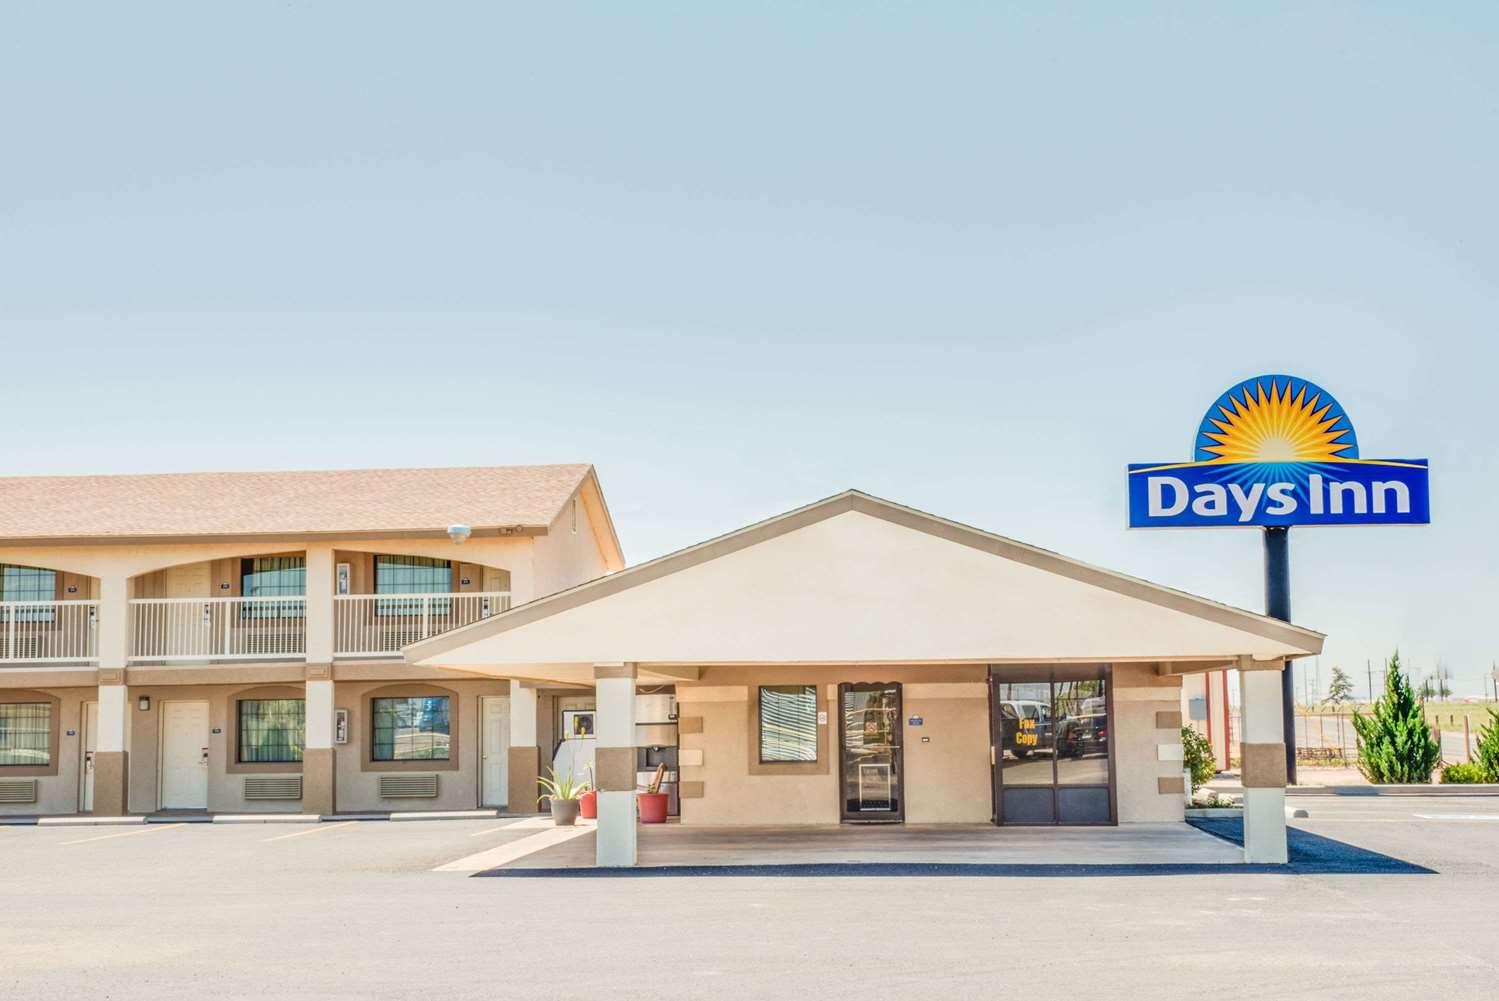 Days Inn Andrews Texas